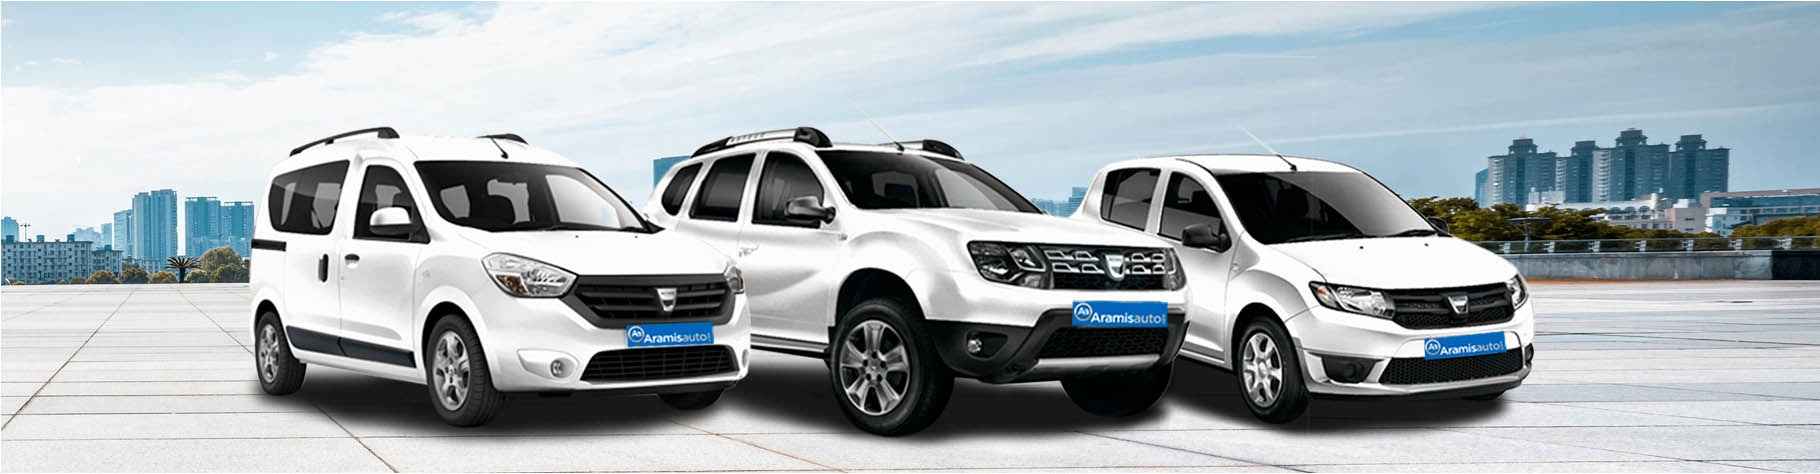 Guide d'achat Dacia